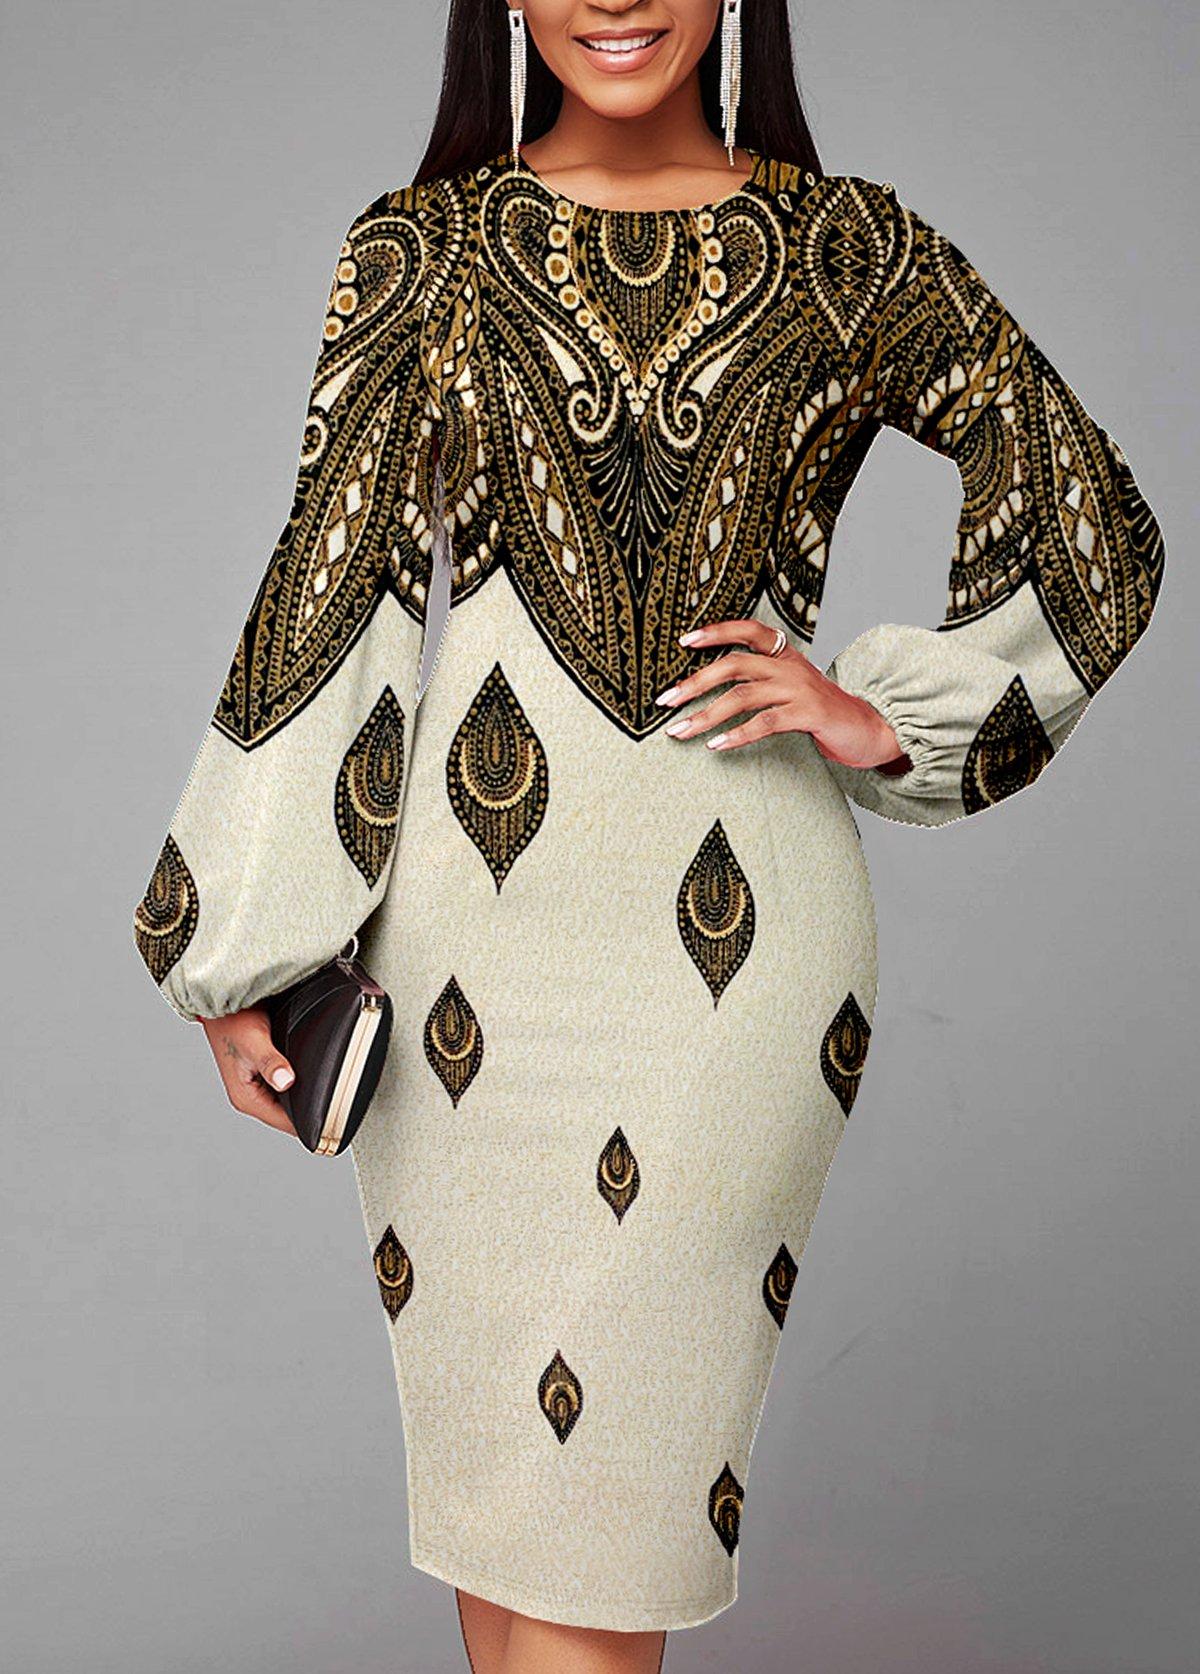 Lantern Sleeve Foil Print Texture Knitted Dress